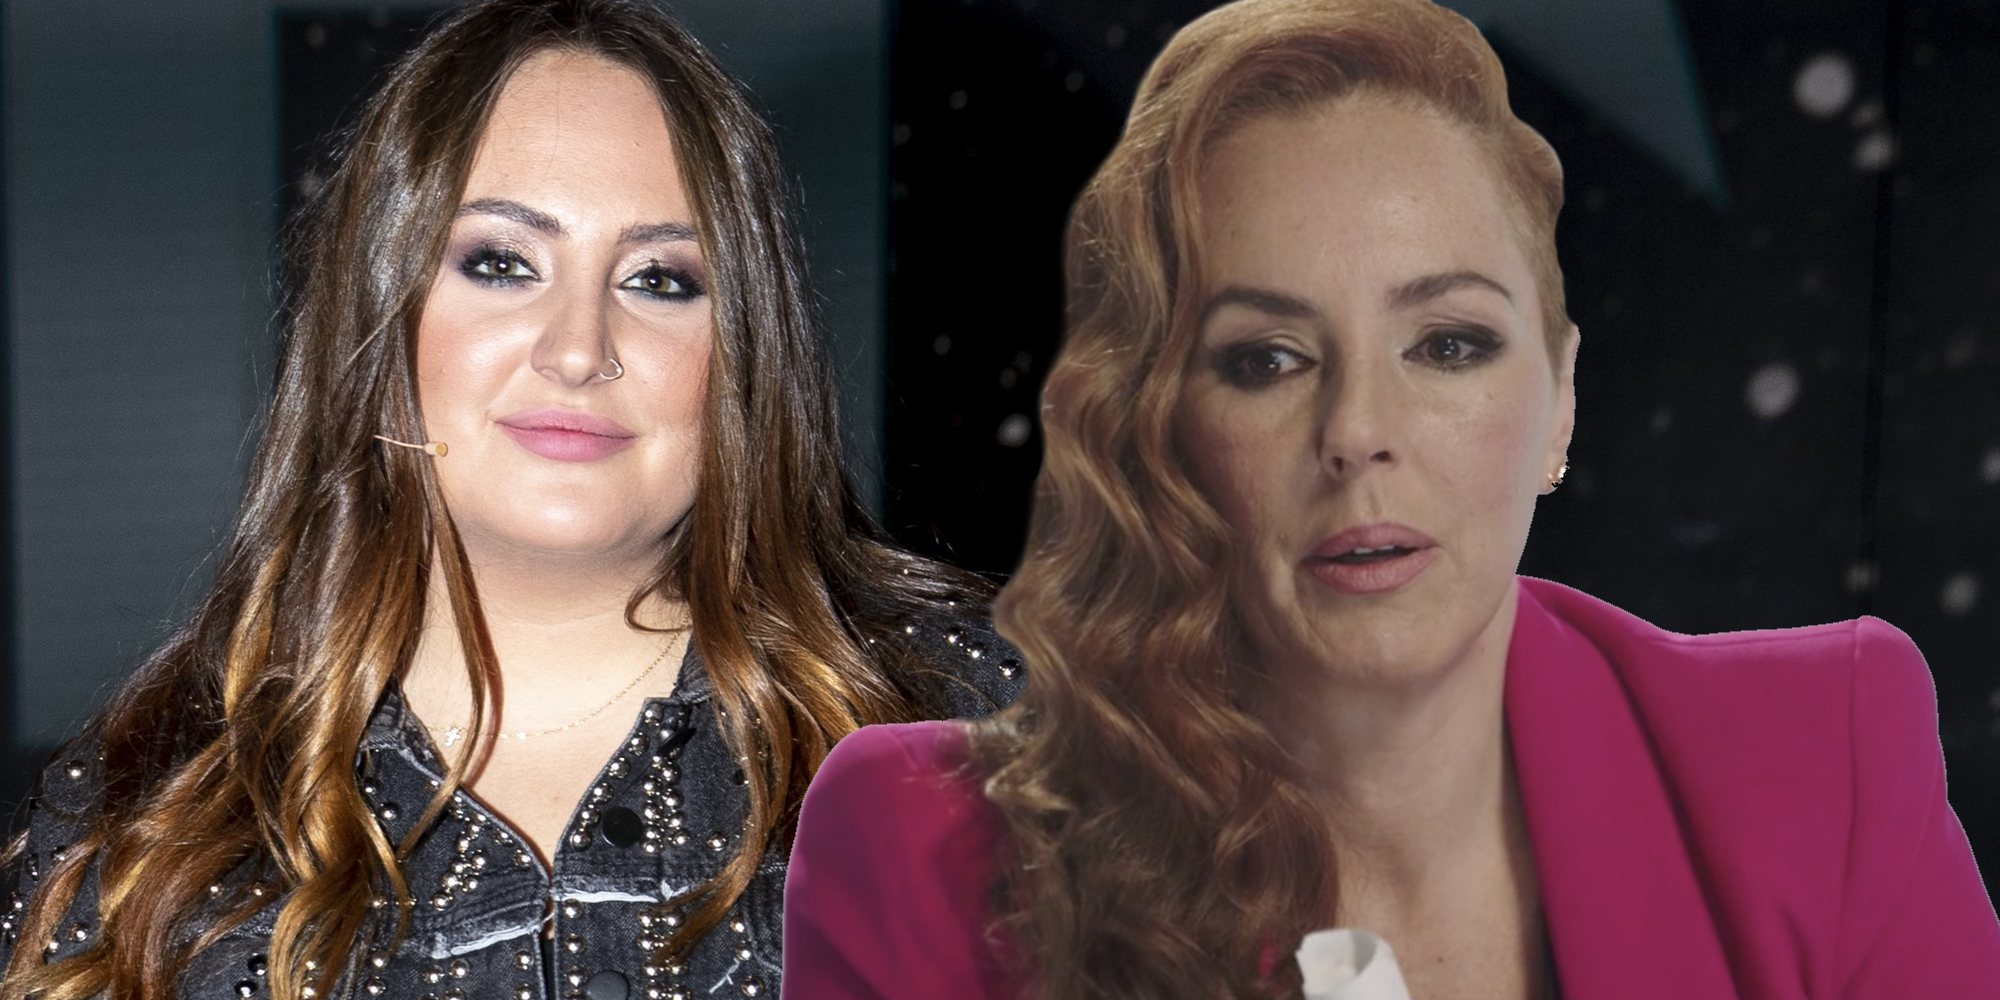 La importante confesión que Rocío Flores le hizo a Belén Esteban sobre su madre Rocío Carrasco